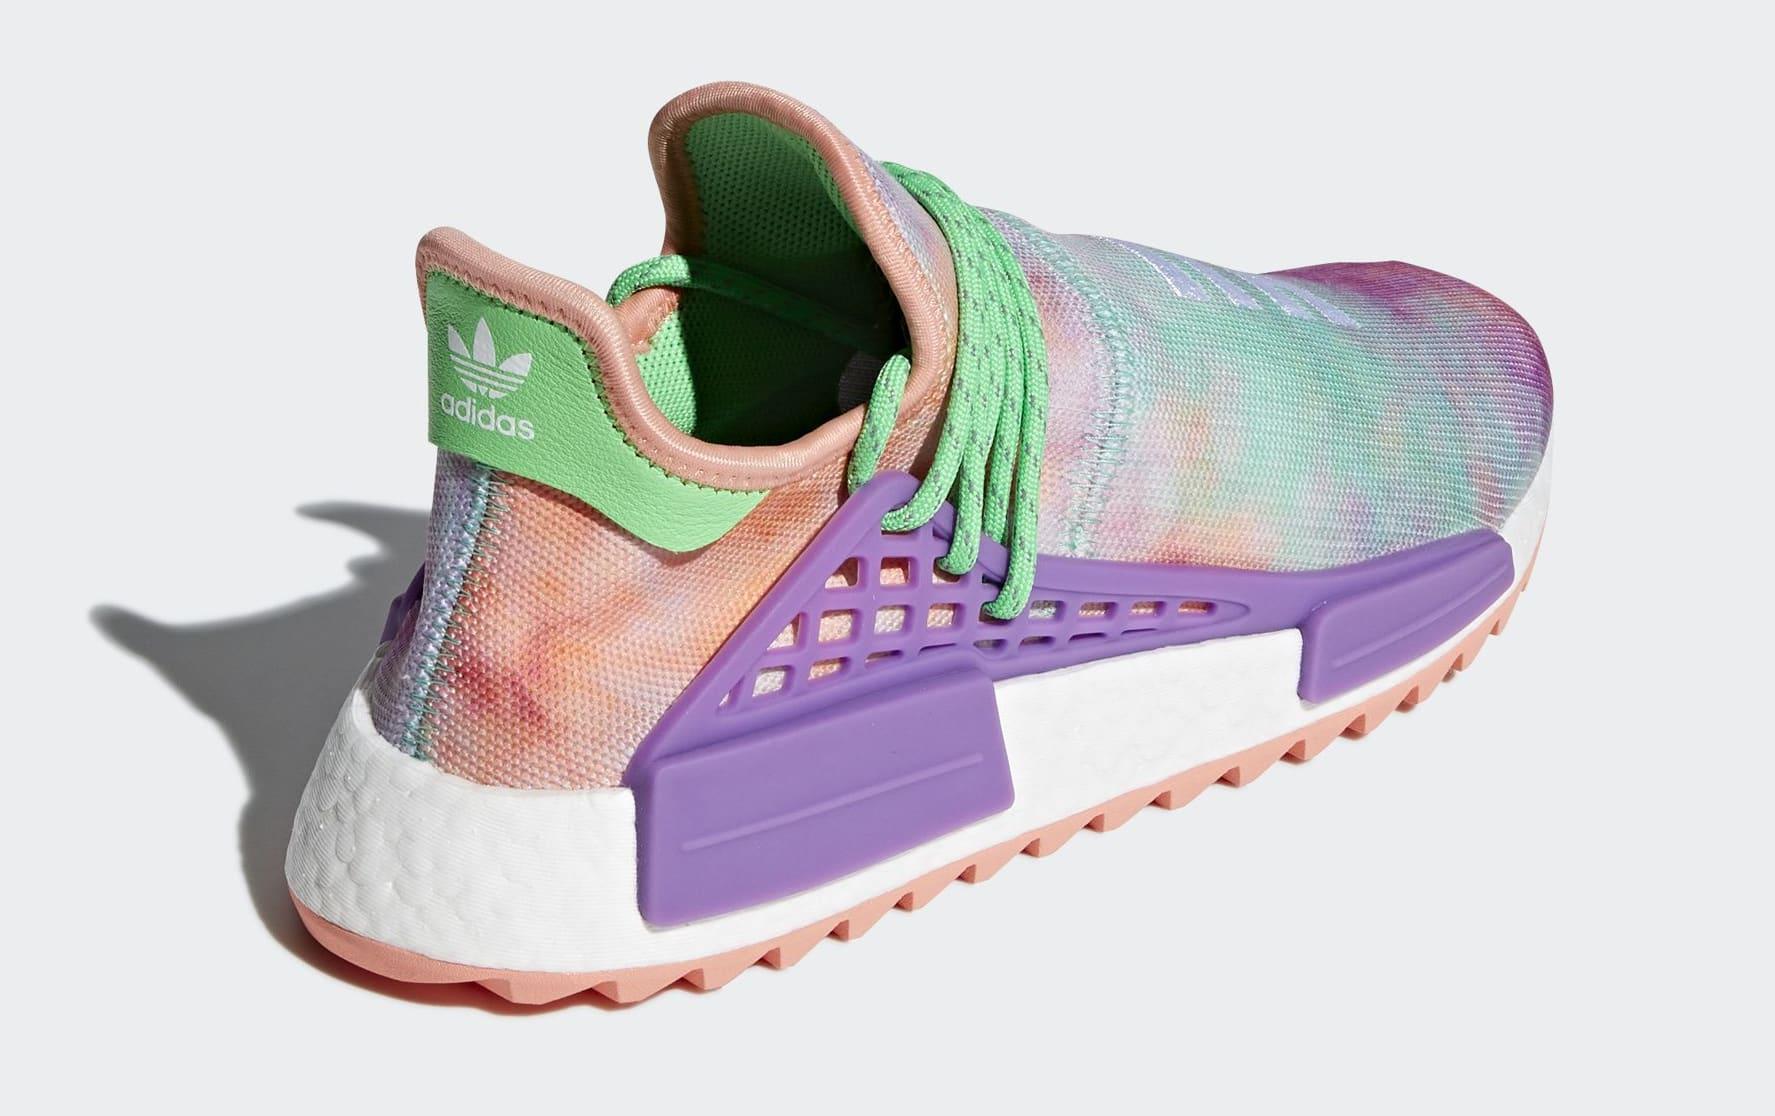 Pharrell x Adidas NMD HU Trail 'Holi' AC7034 (Heel)